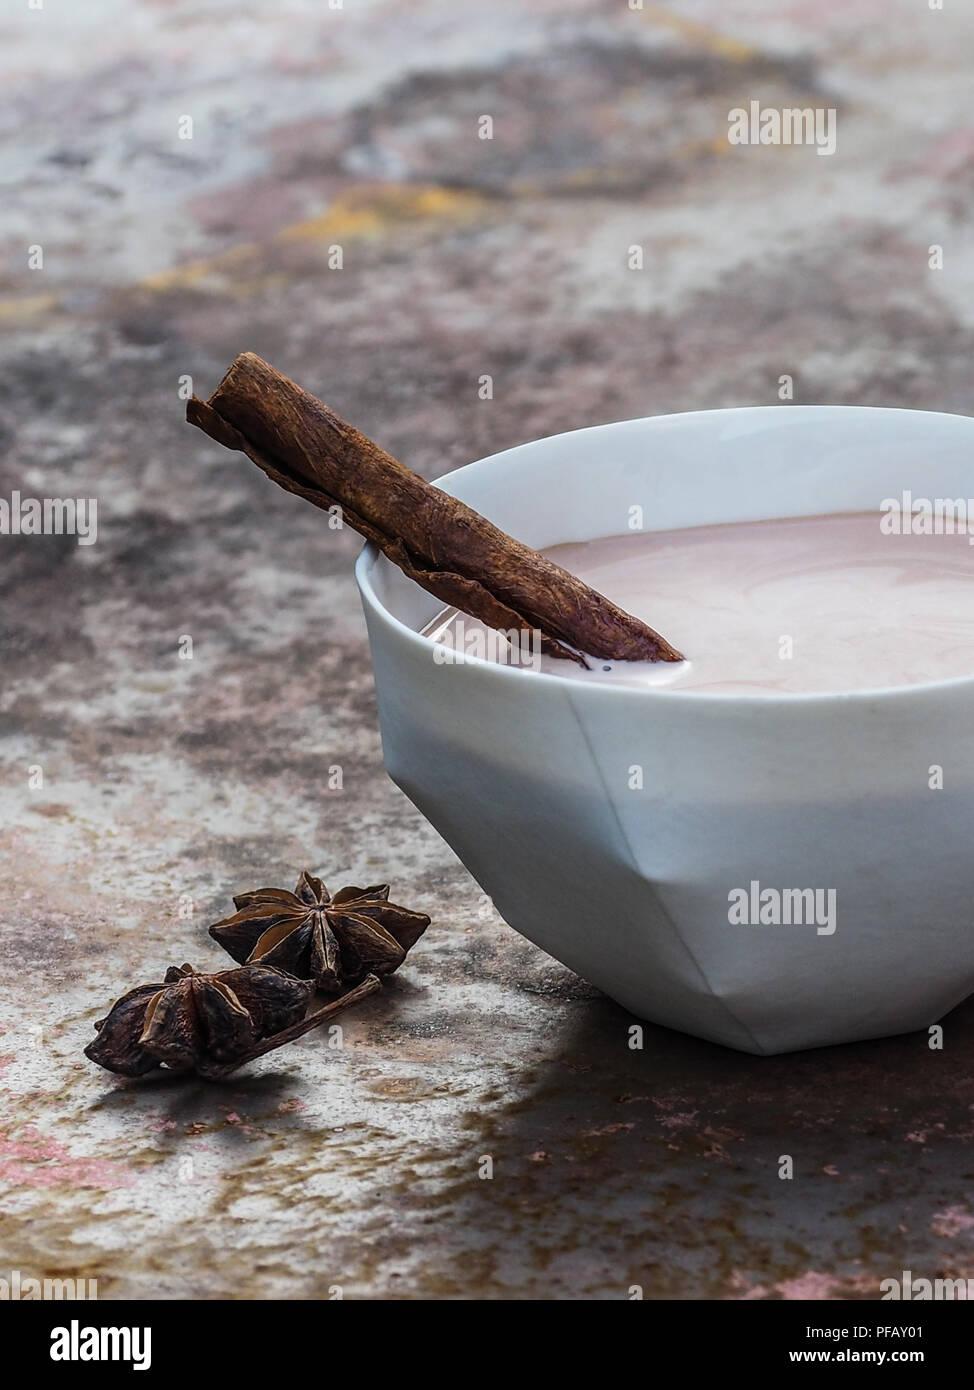 Homemade chai tea latte with cinnamon stick. - Stock Image